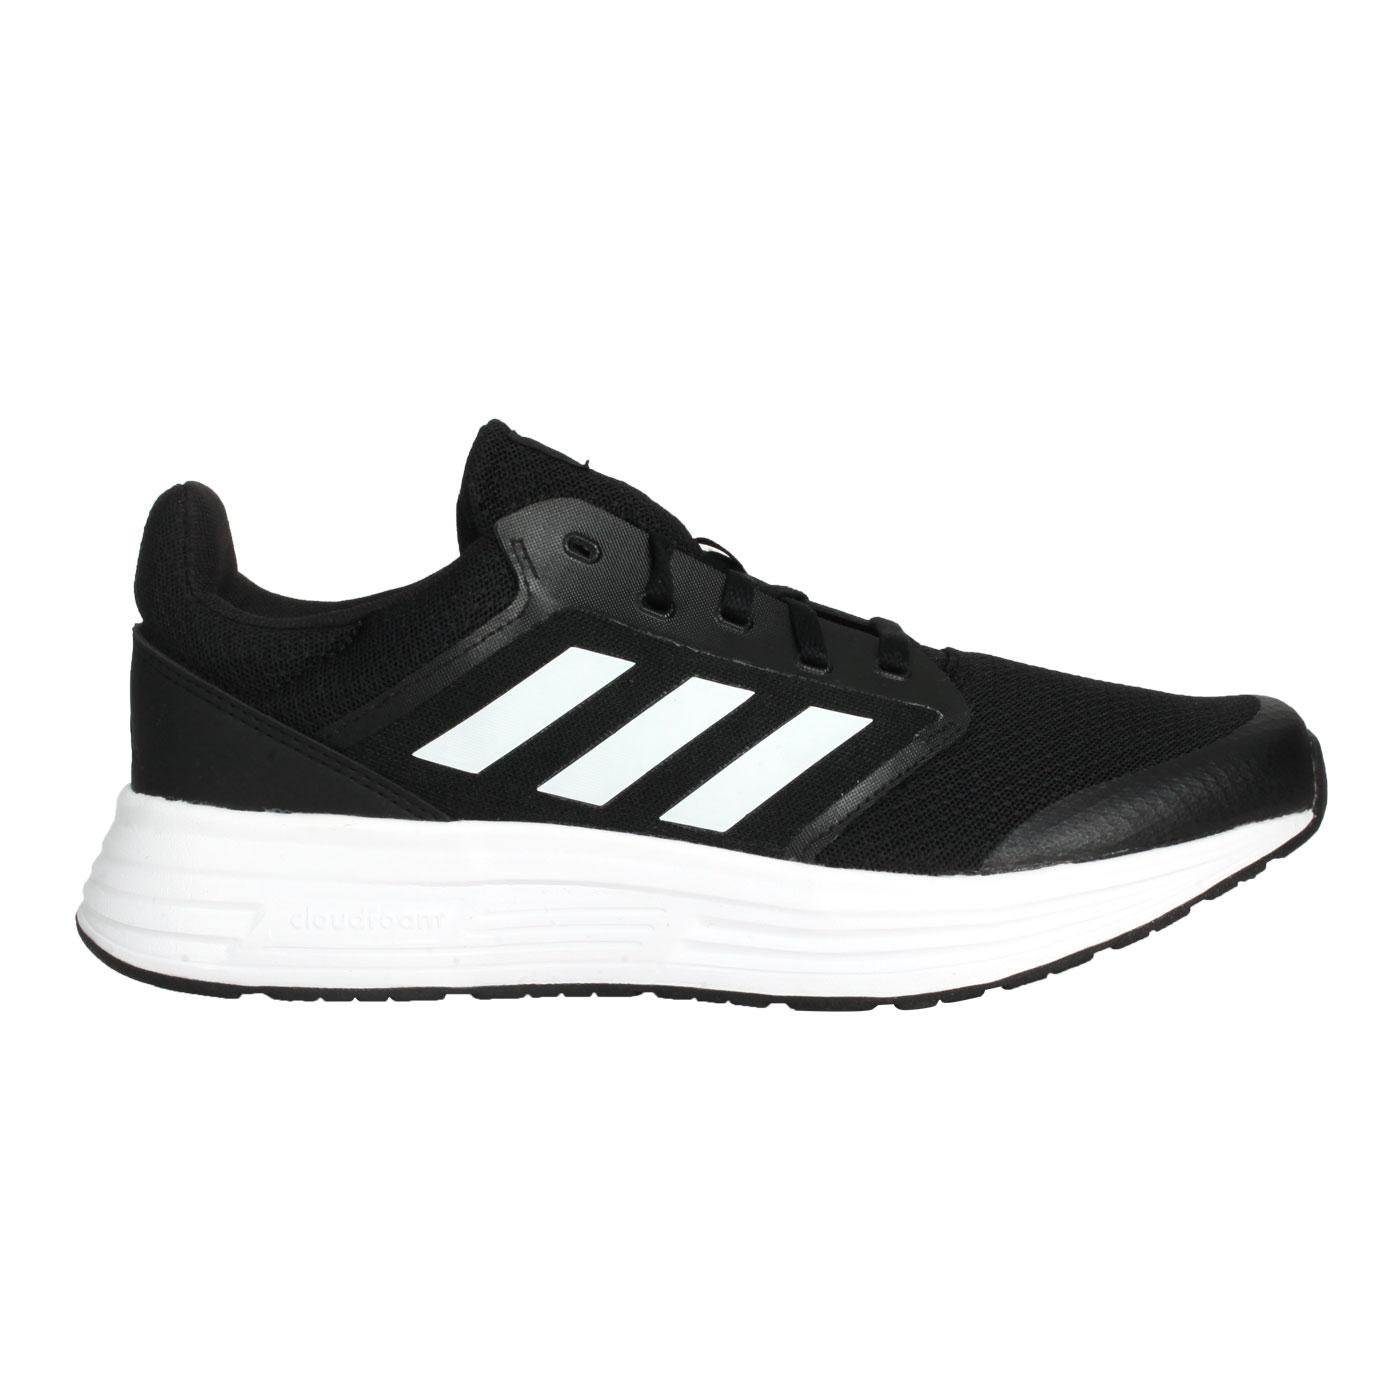 ADIDAS 男款慢跑鞋  @GALAXY 5@FW5717